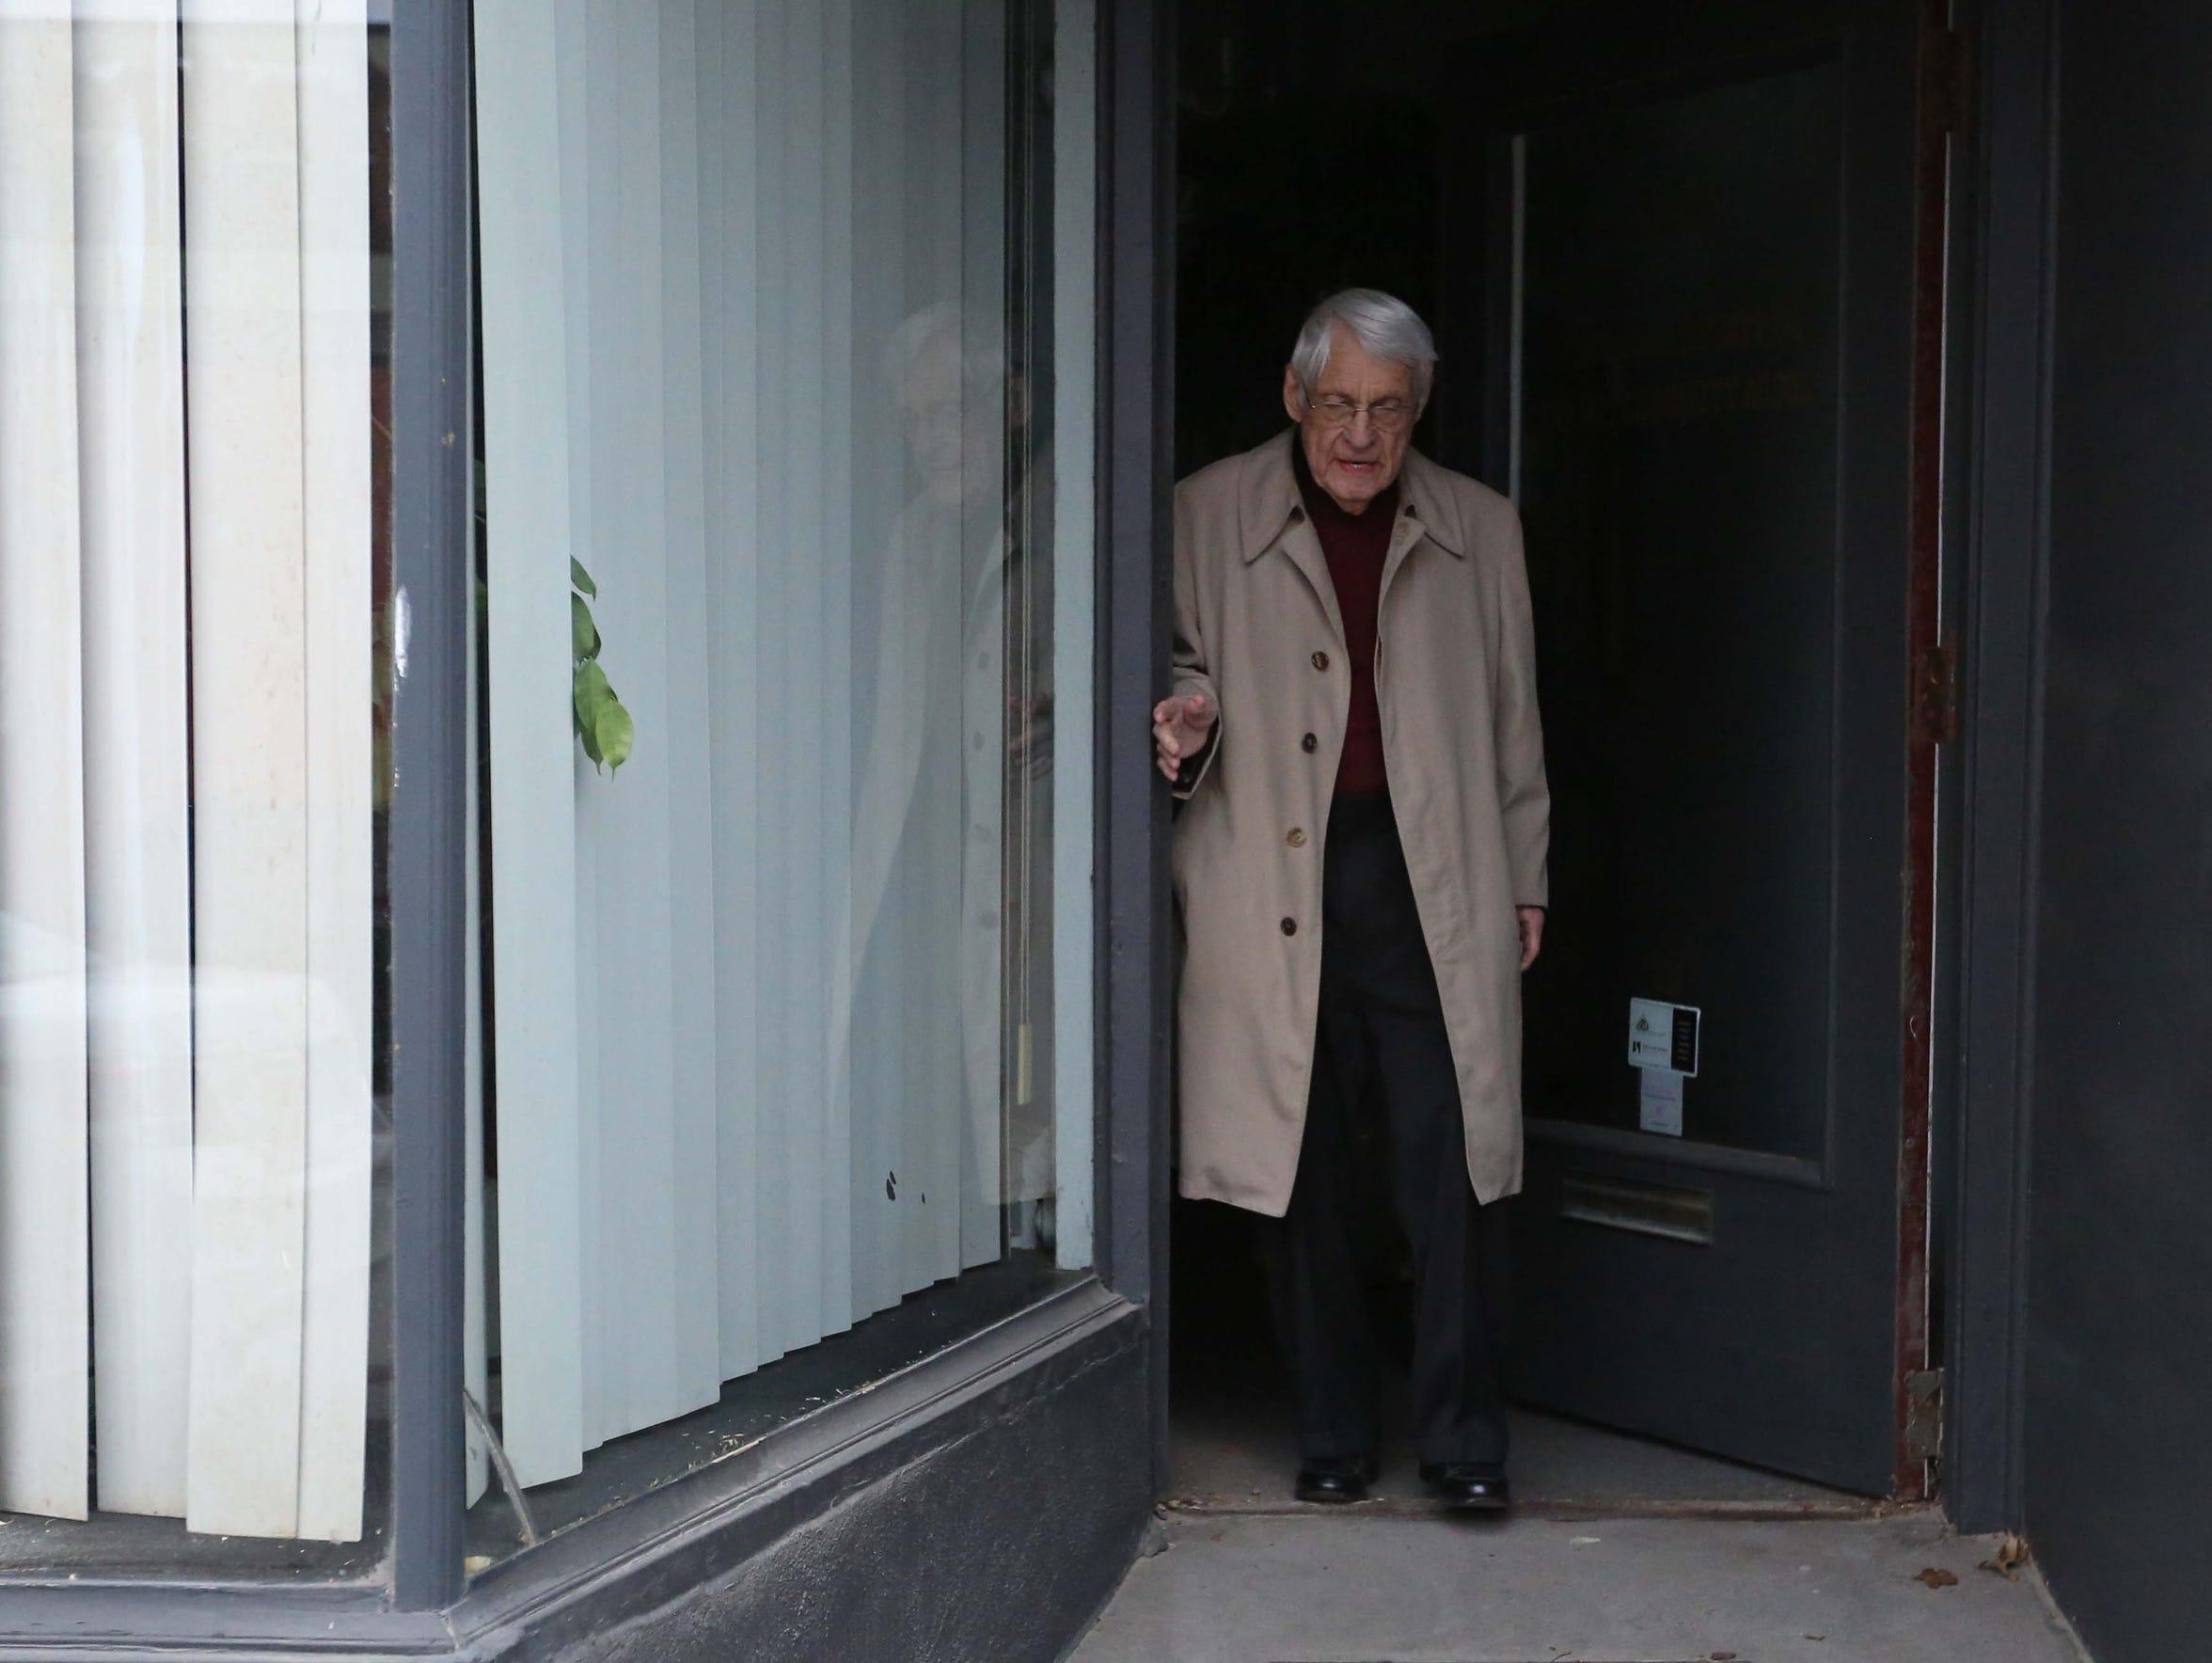 Jim Boyt walks out the doorway of his East Village